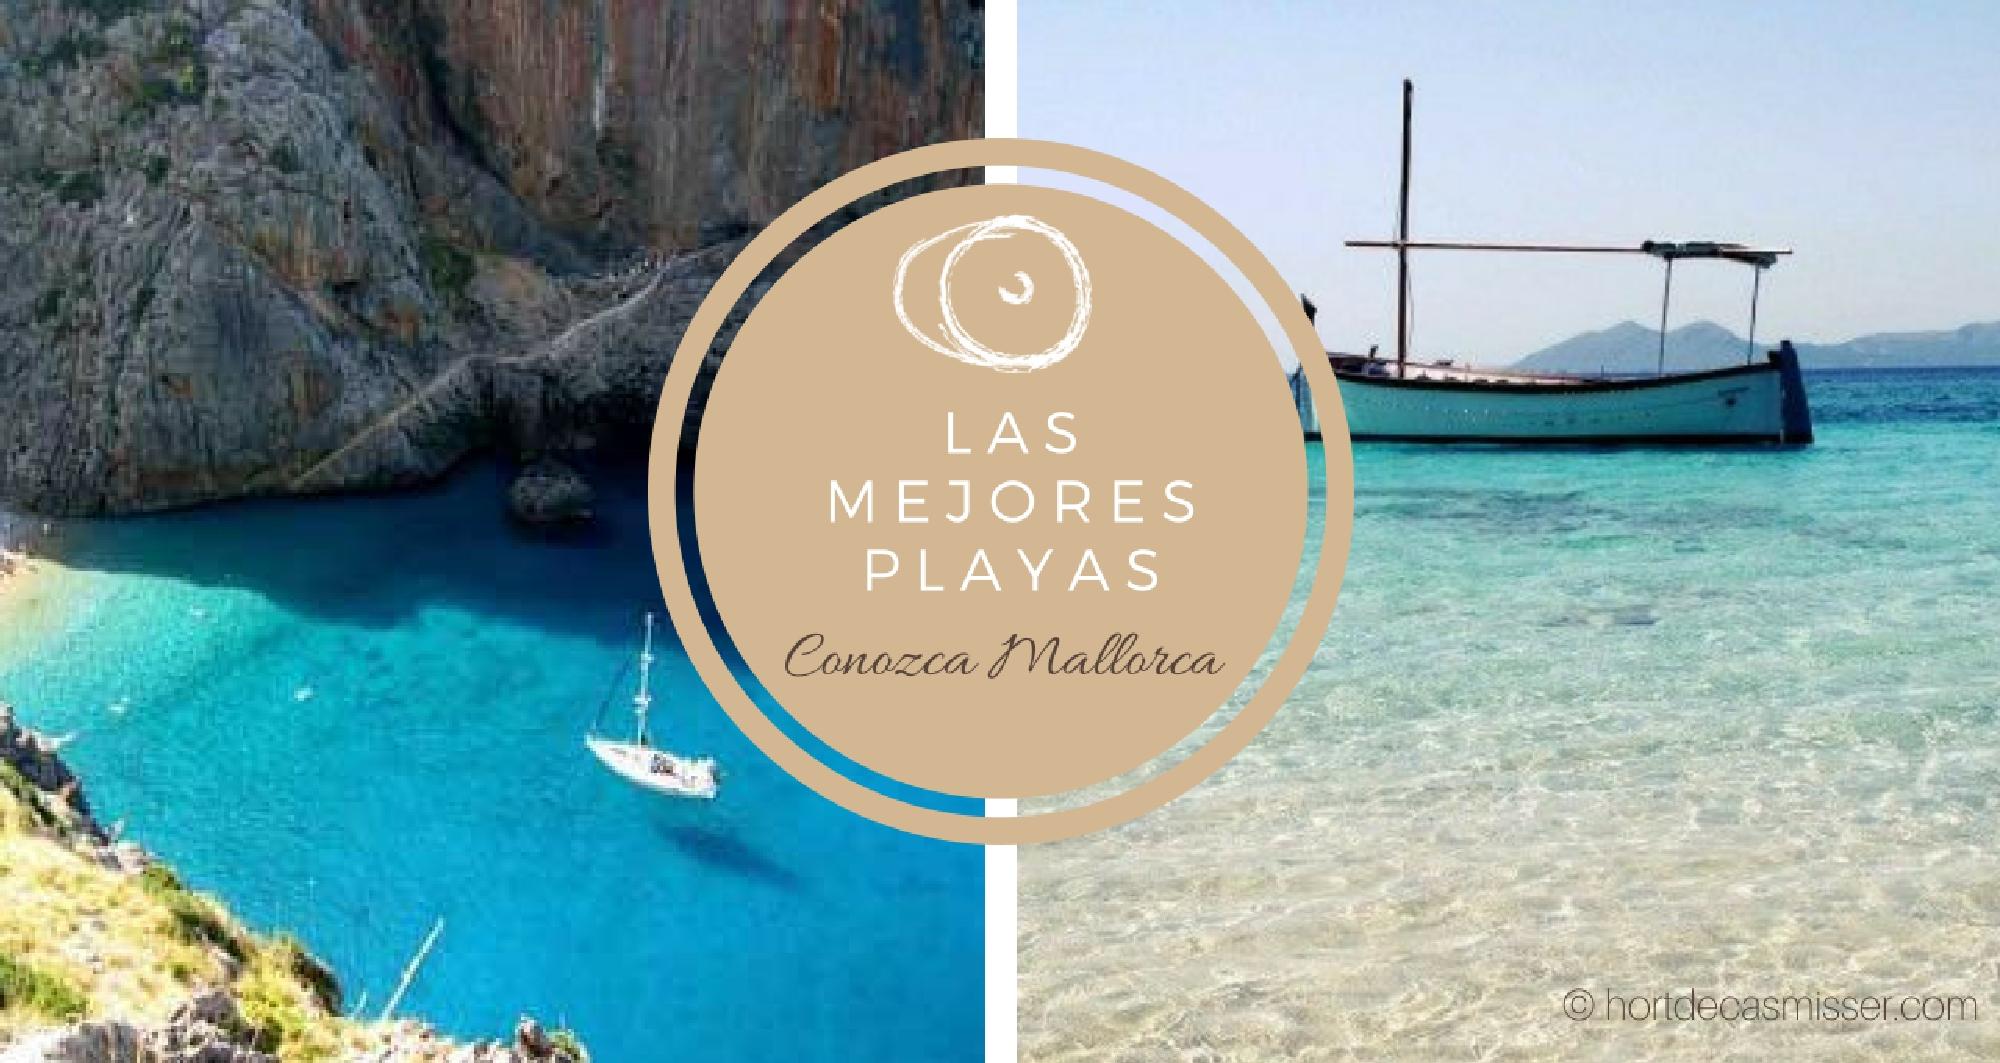 Las Mejores Playa De Mallorca Hort De Cas Misser Portada